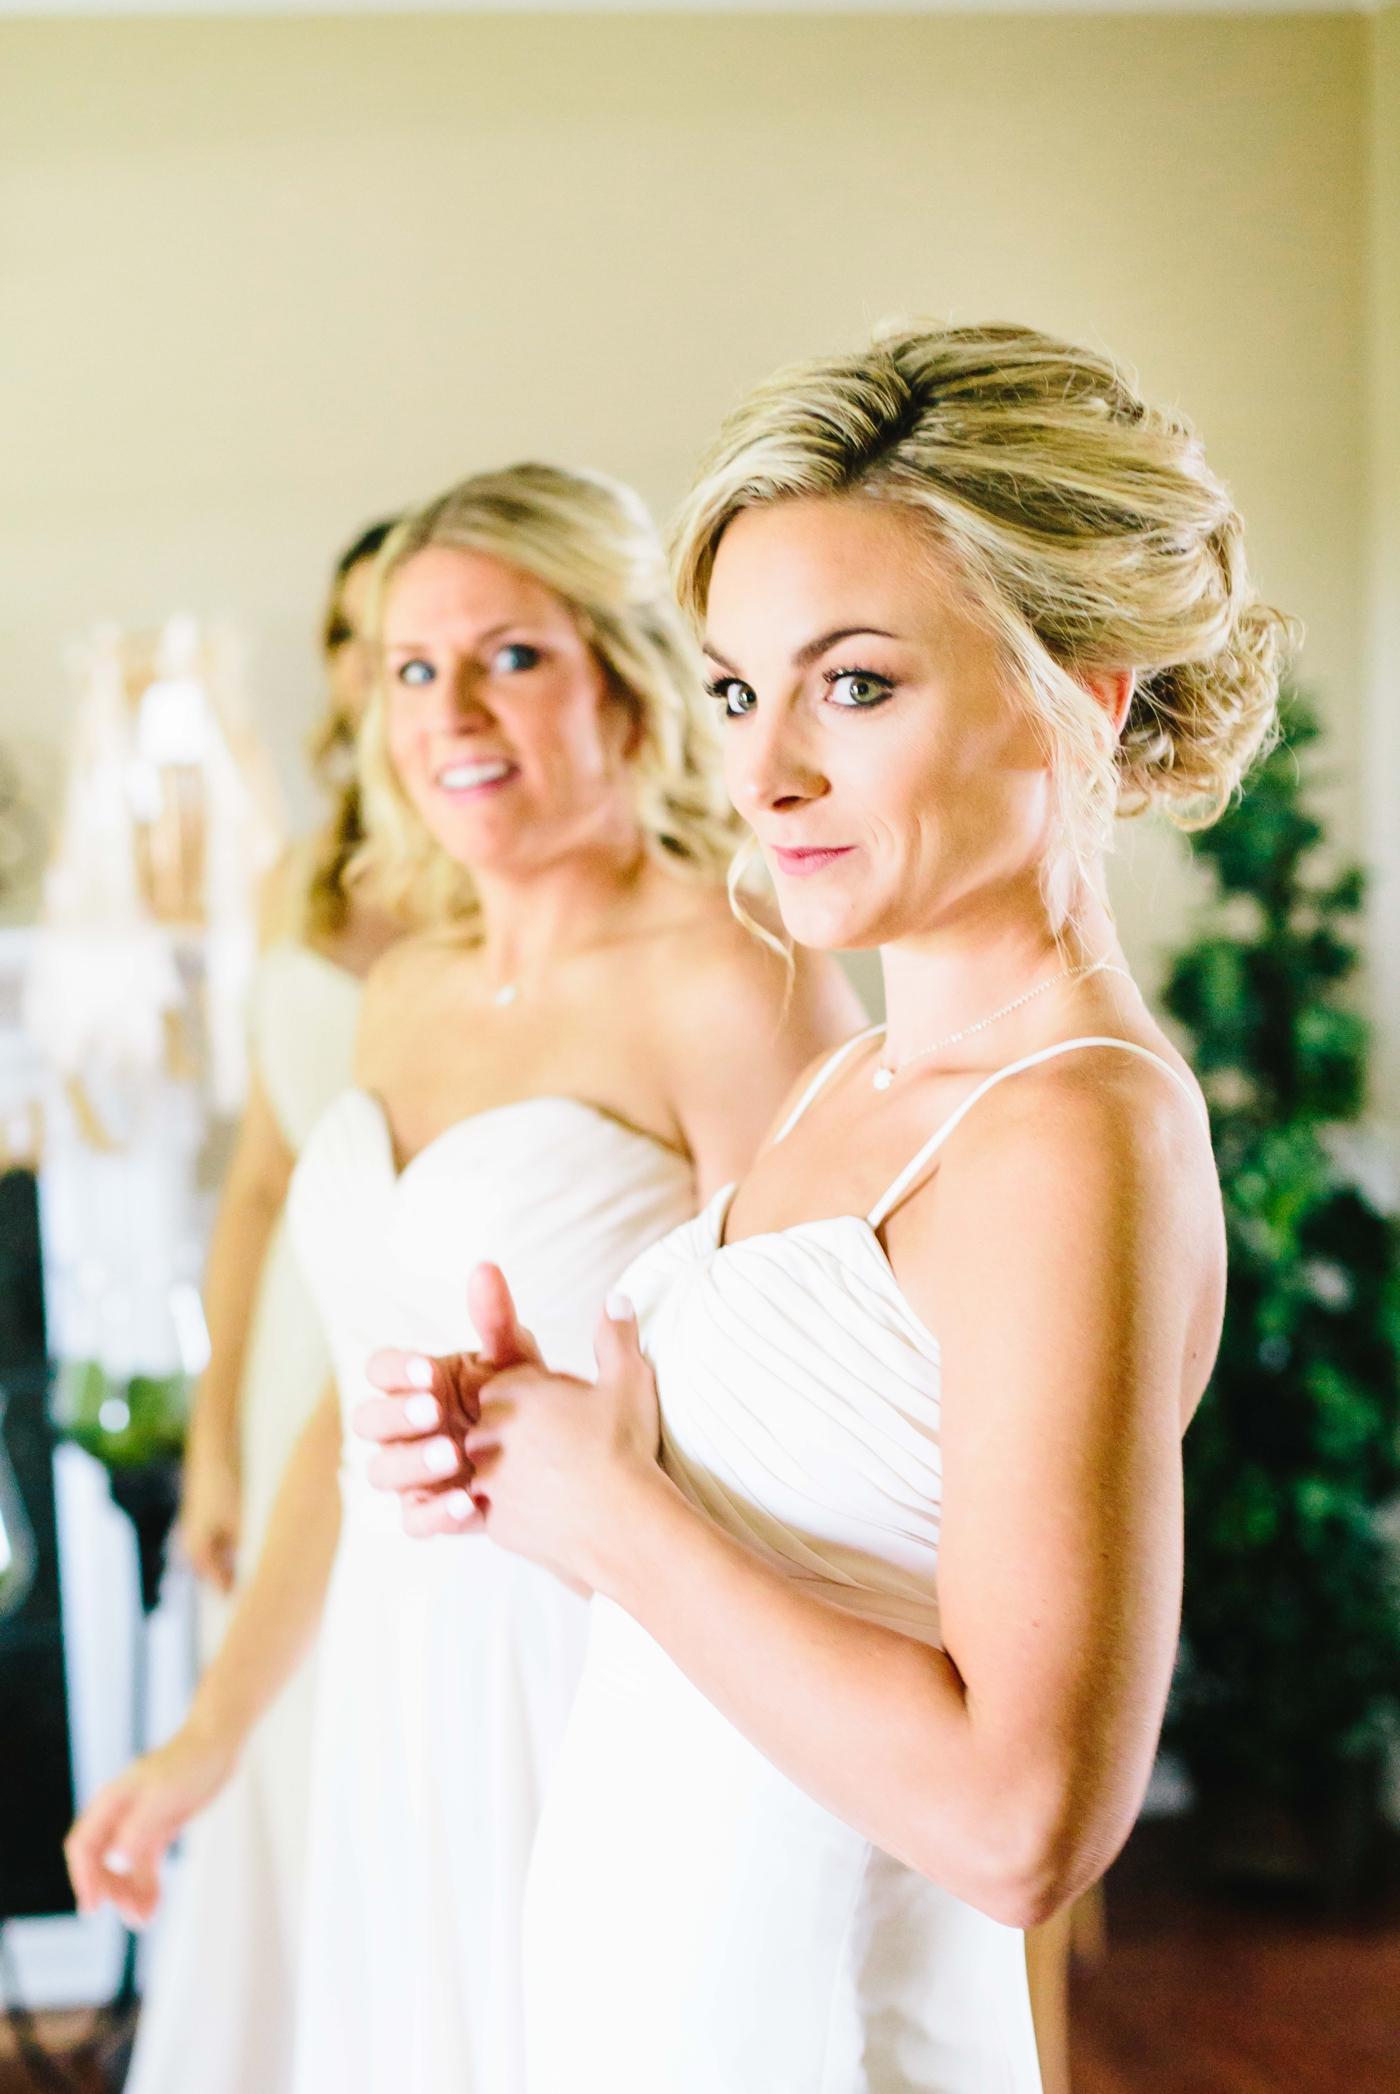 chicago-fine-art-wedding-photography-patano5